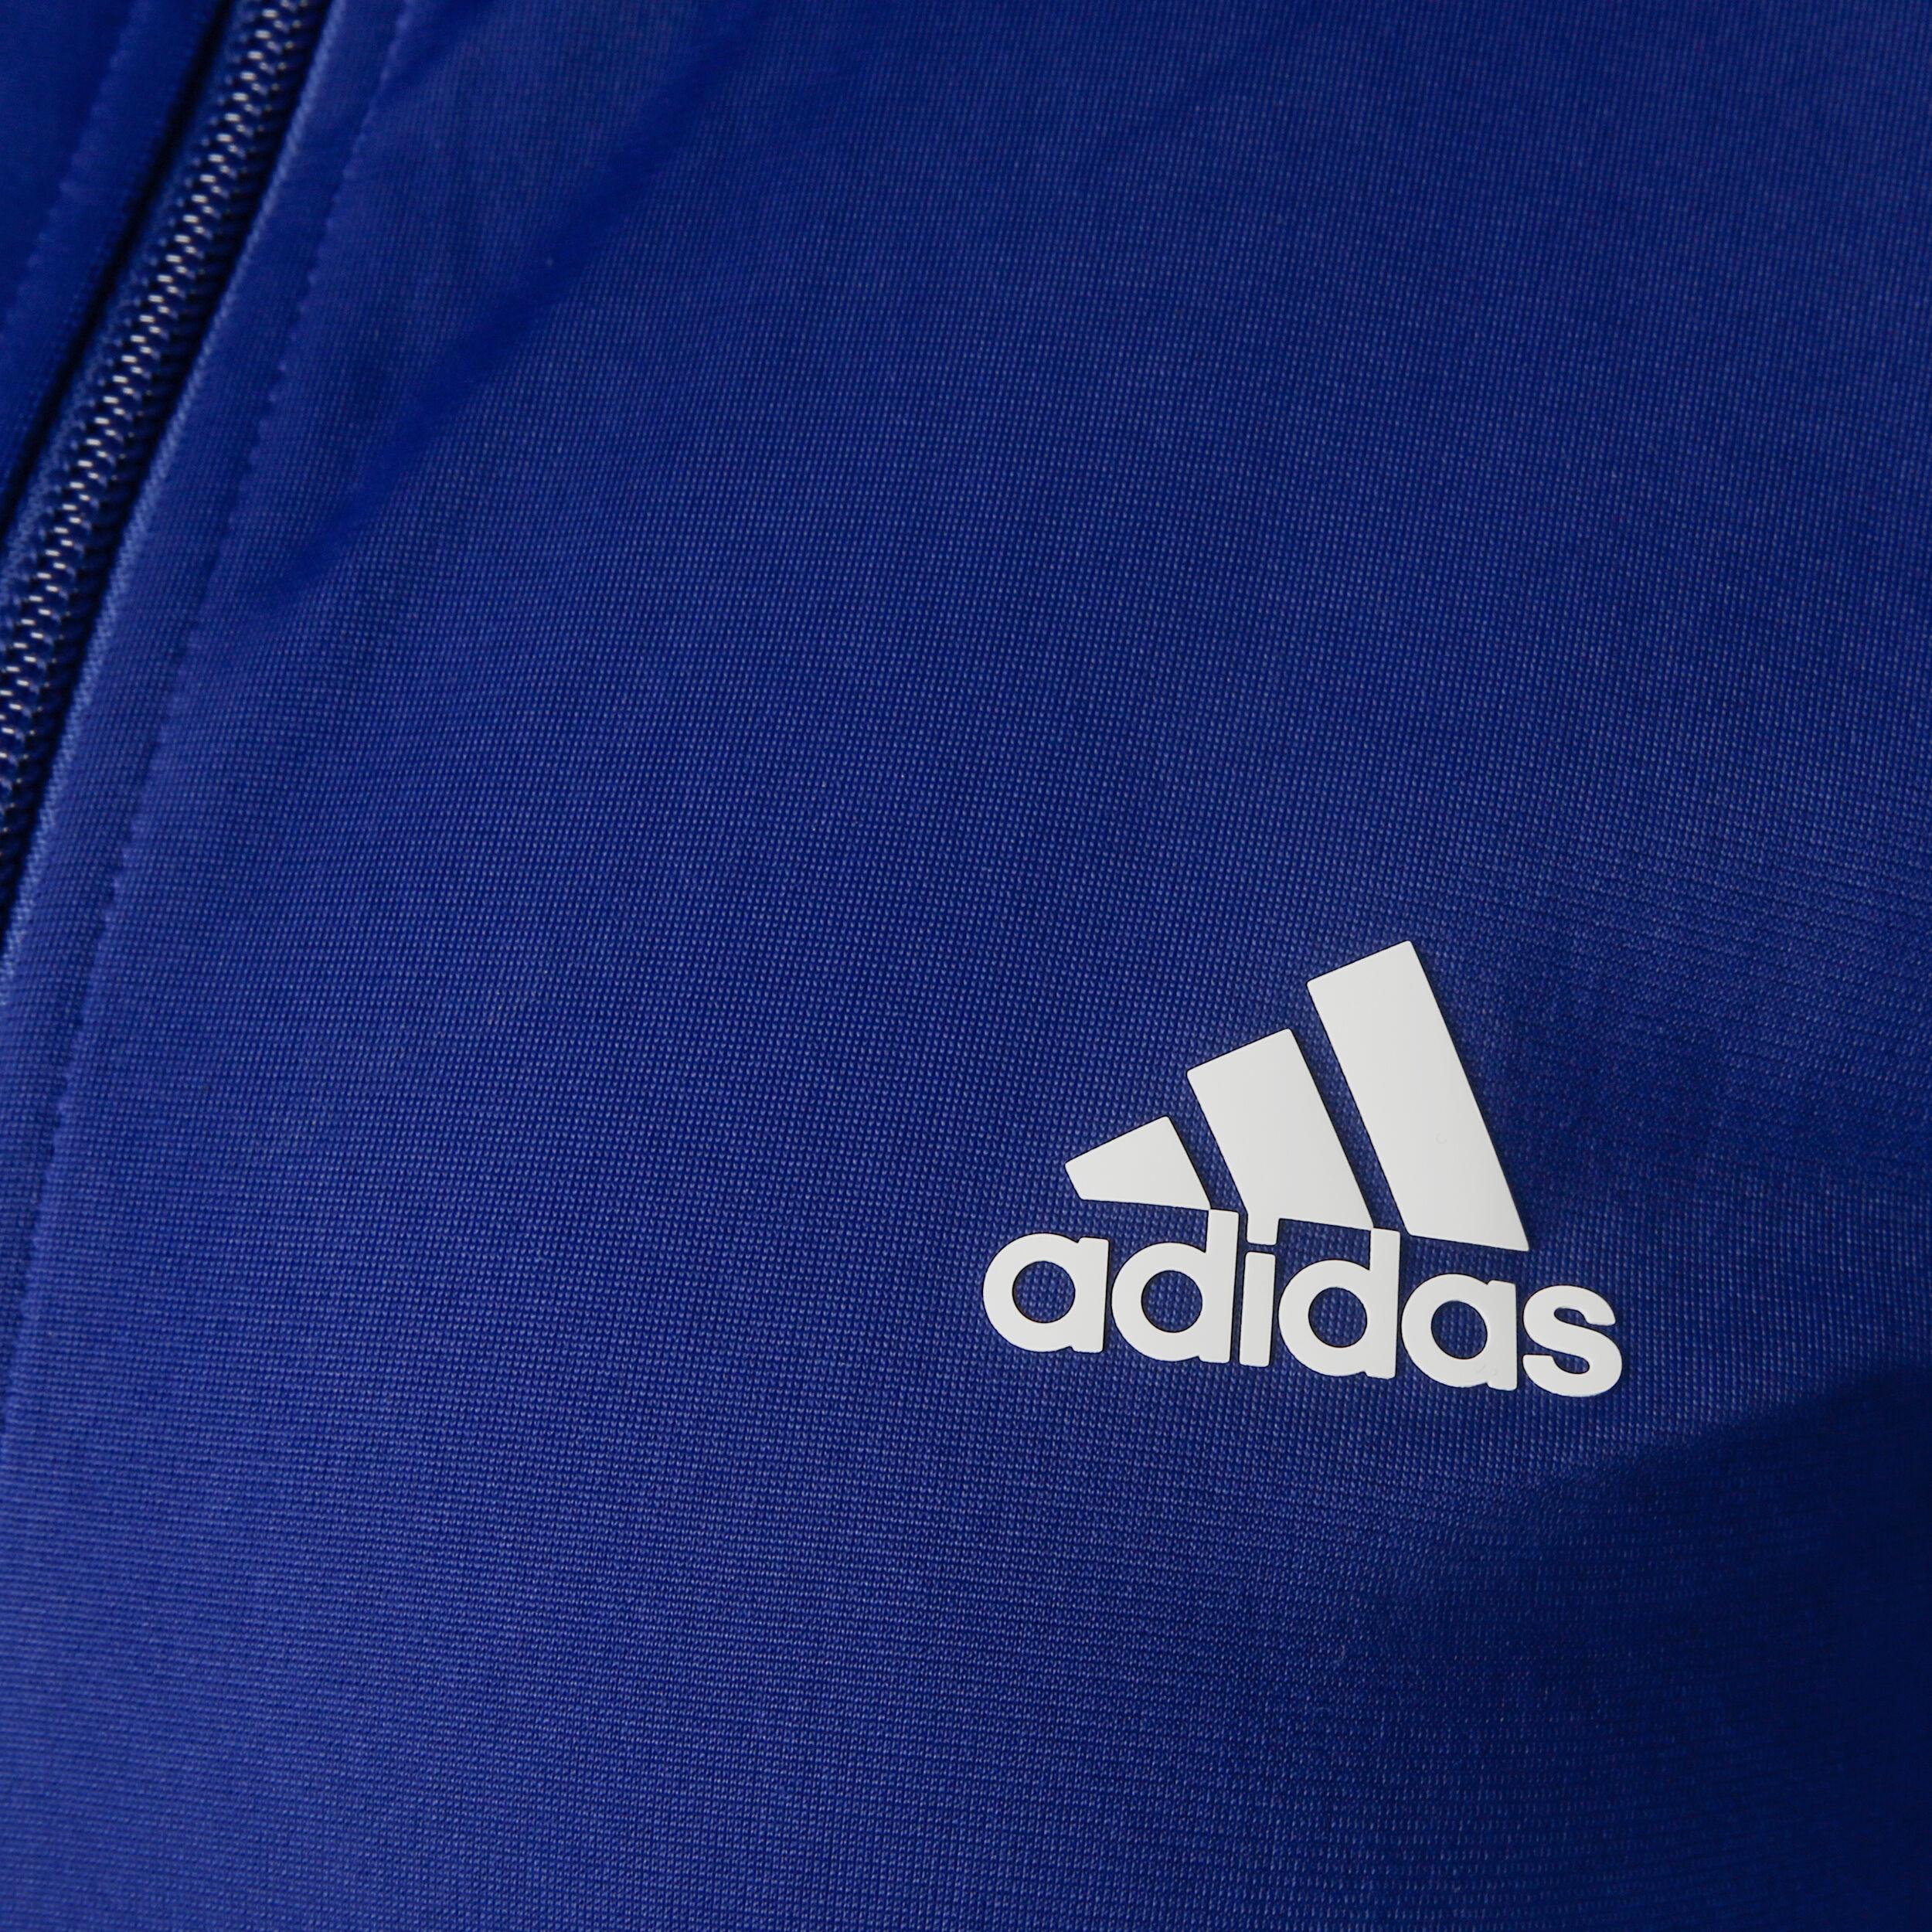 adidas Back2Basic 3 Stripes Trainingsanzug Damen Blau